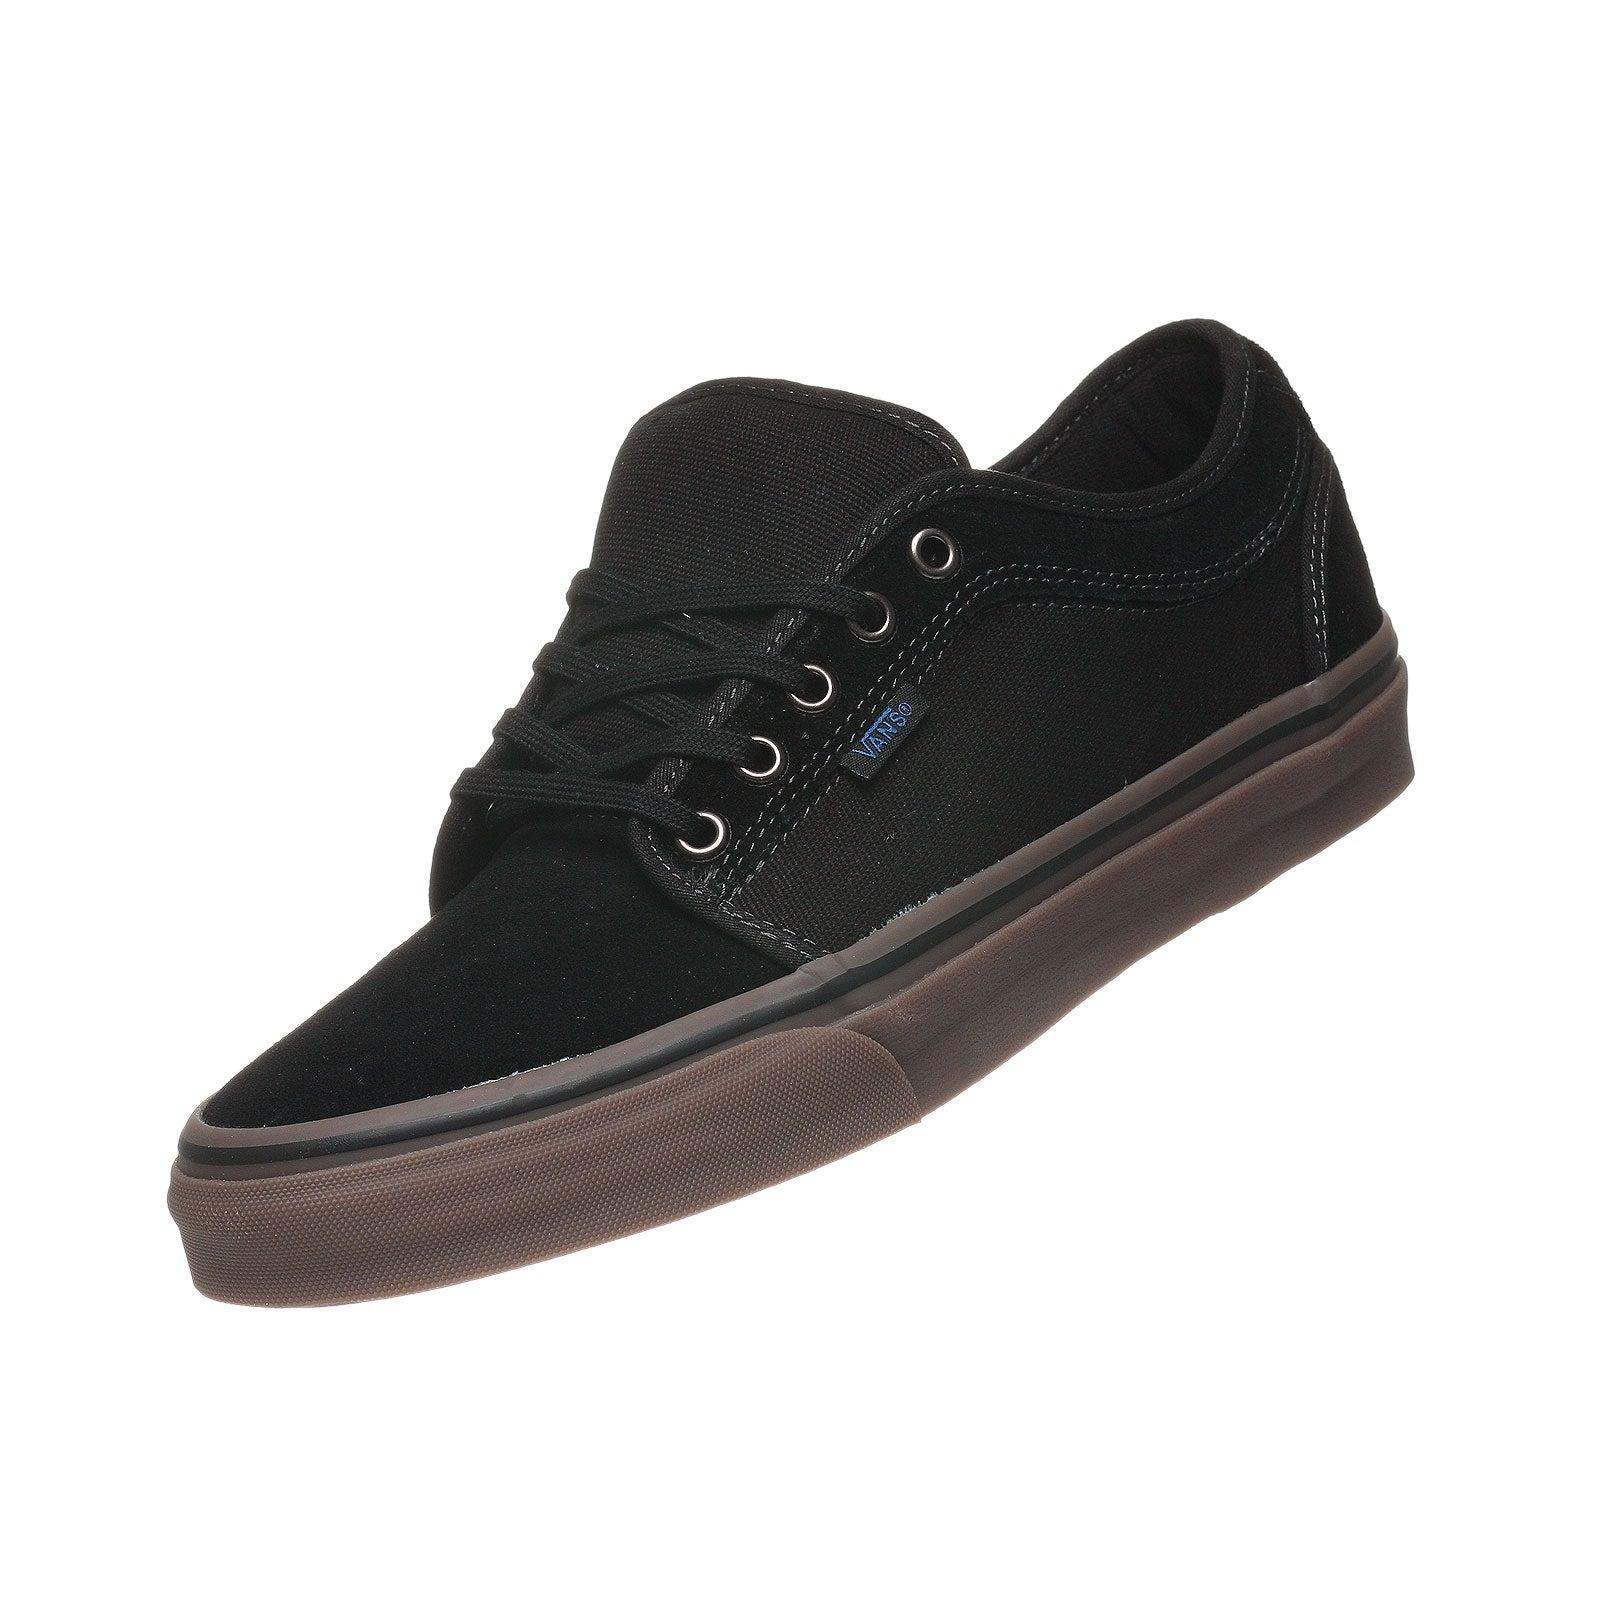 vans chukka low black gum